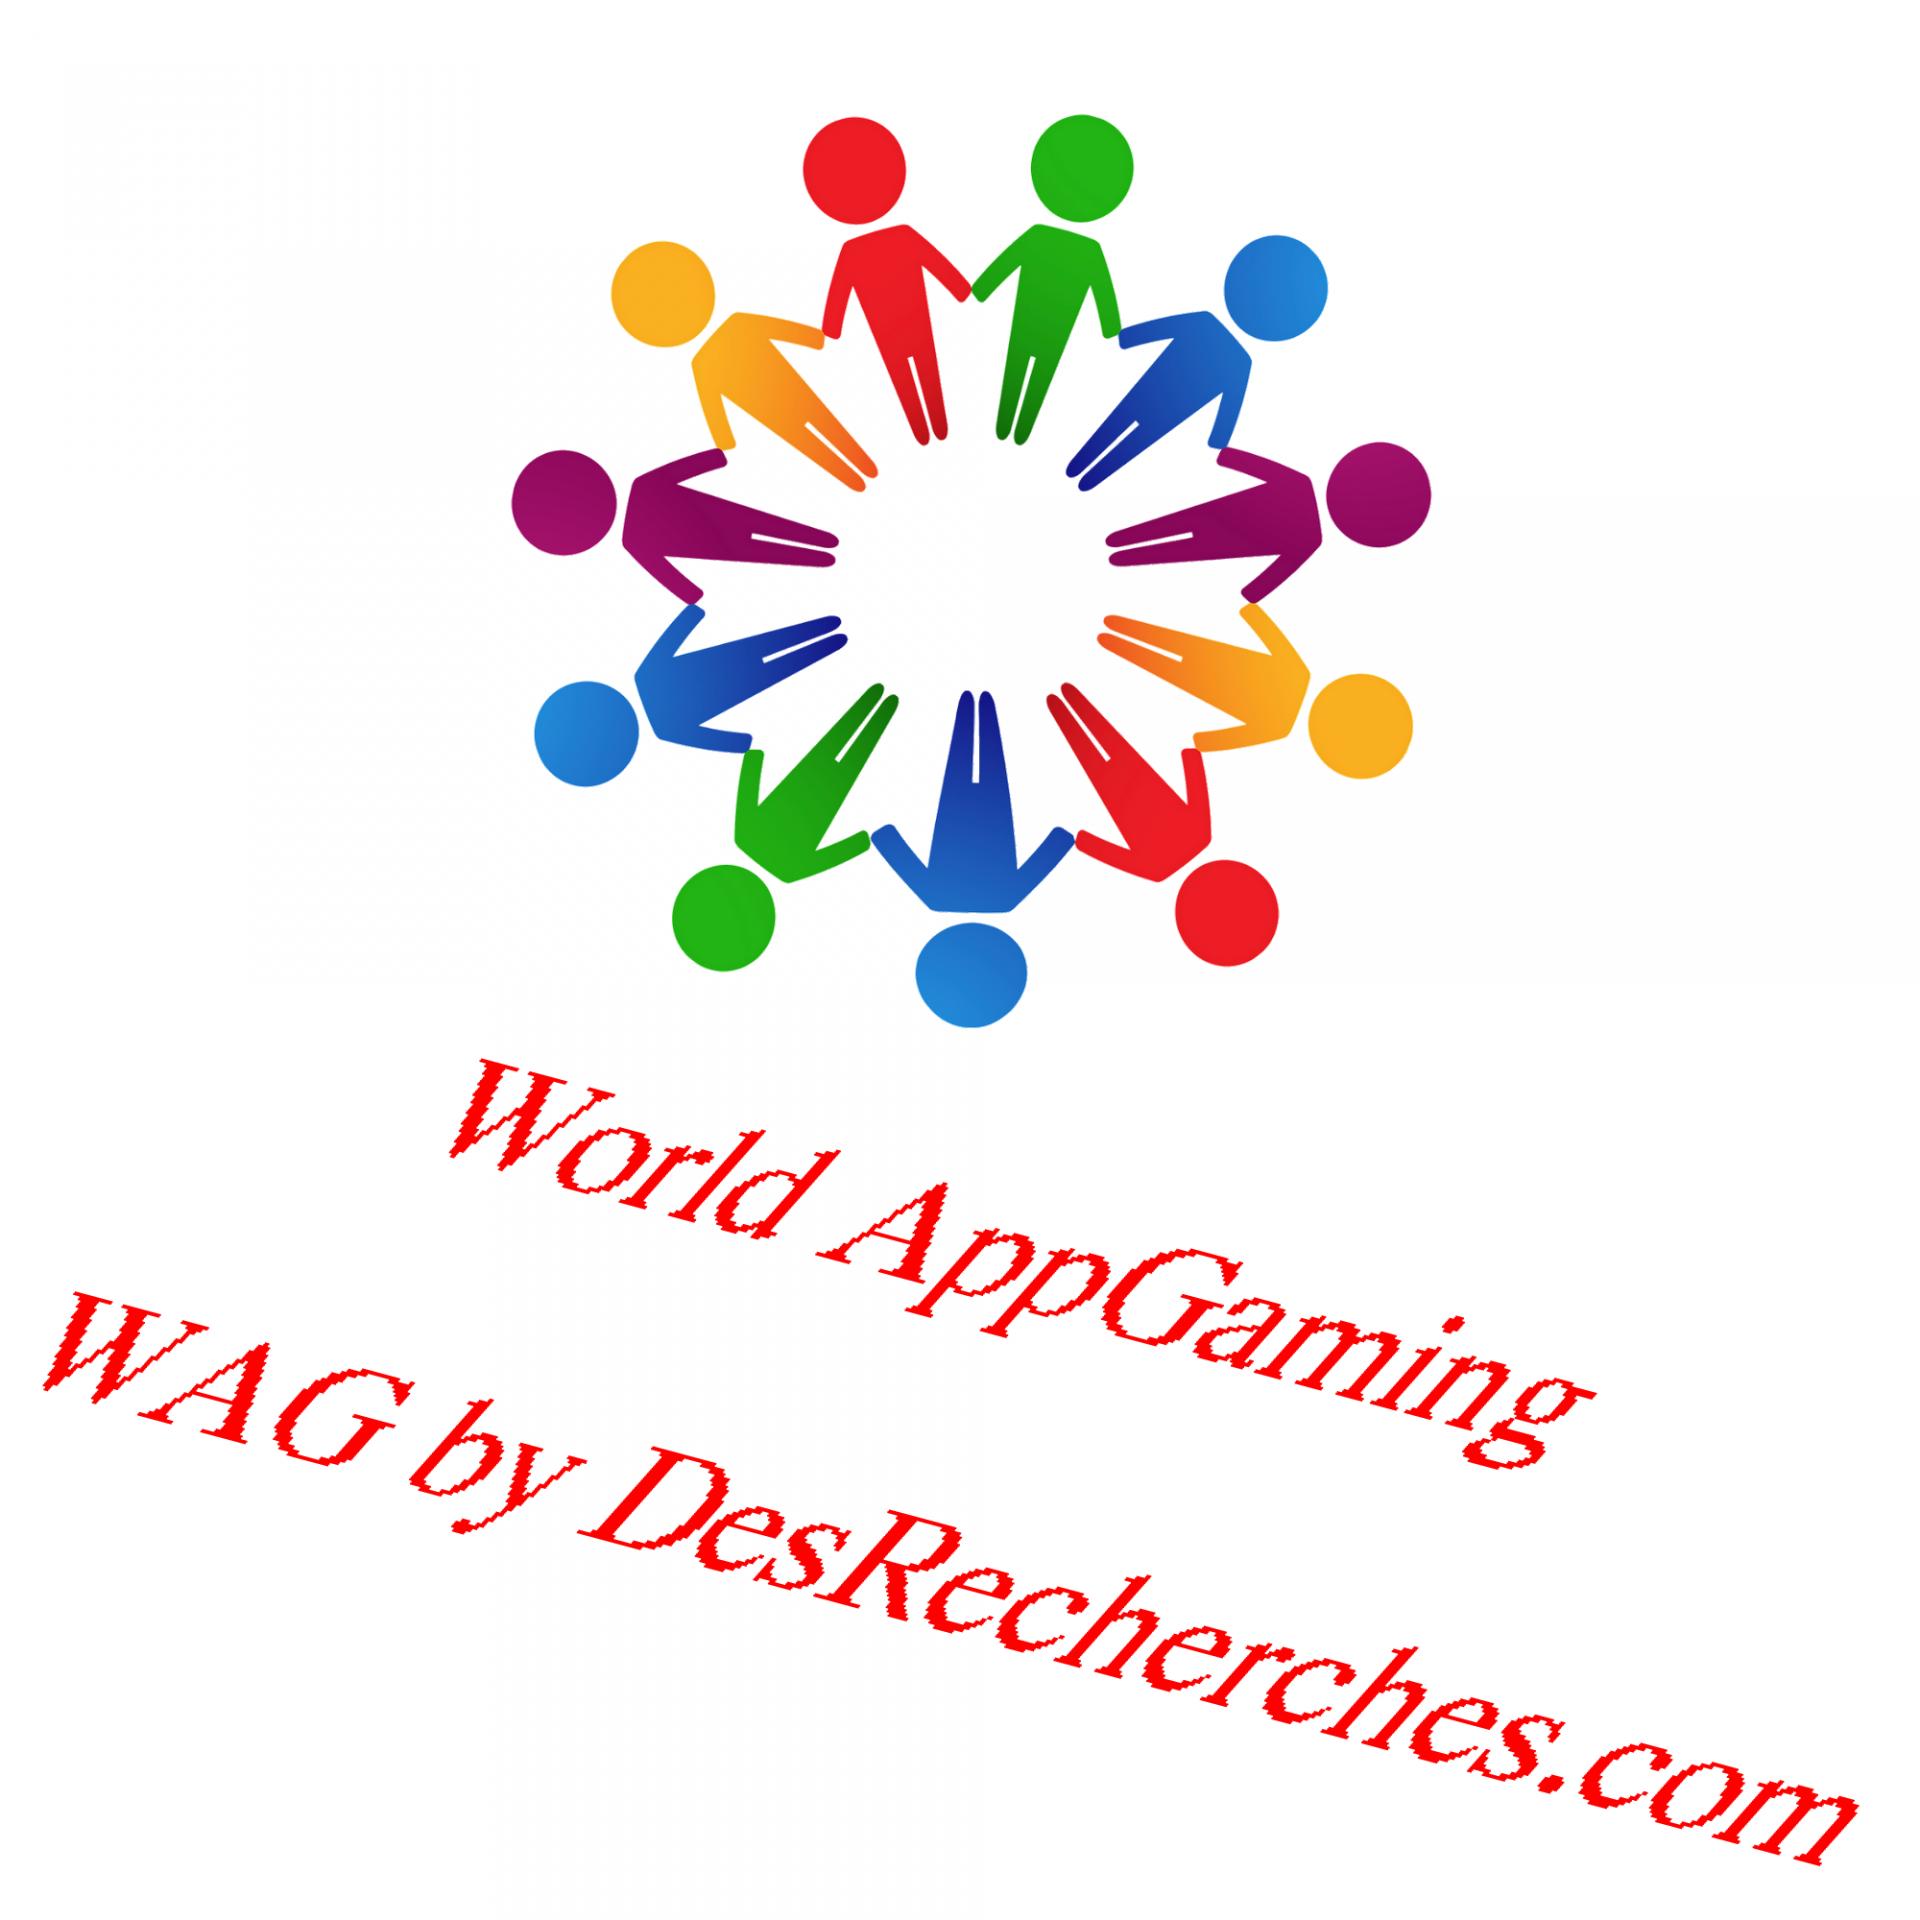 Wag by desrecherches com transparence logo